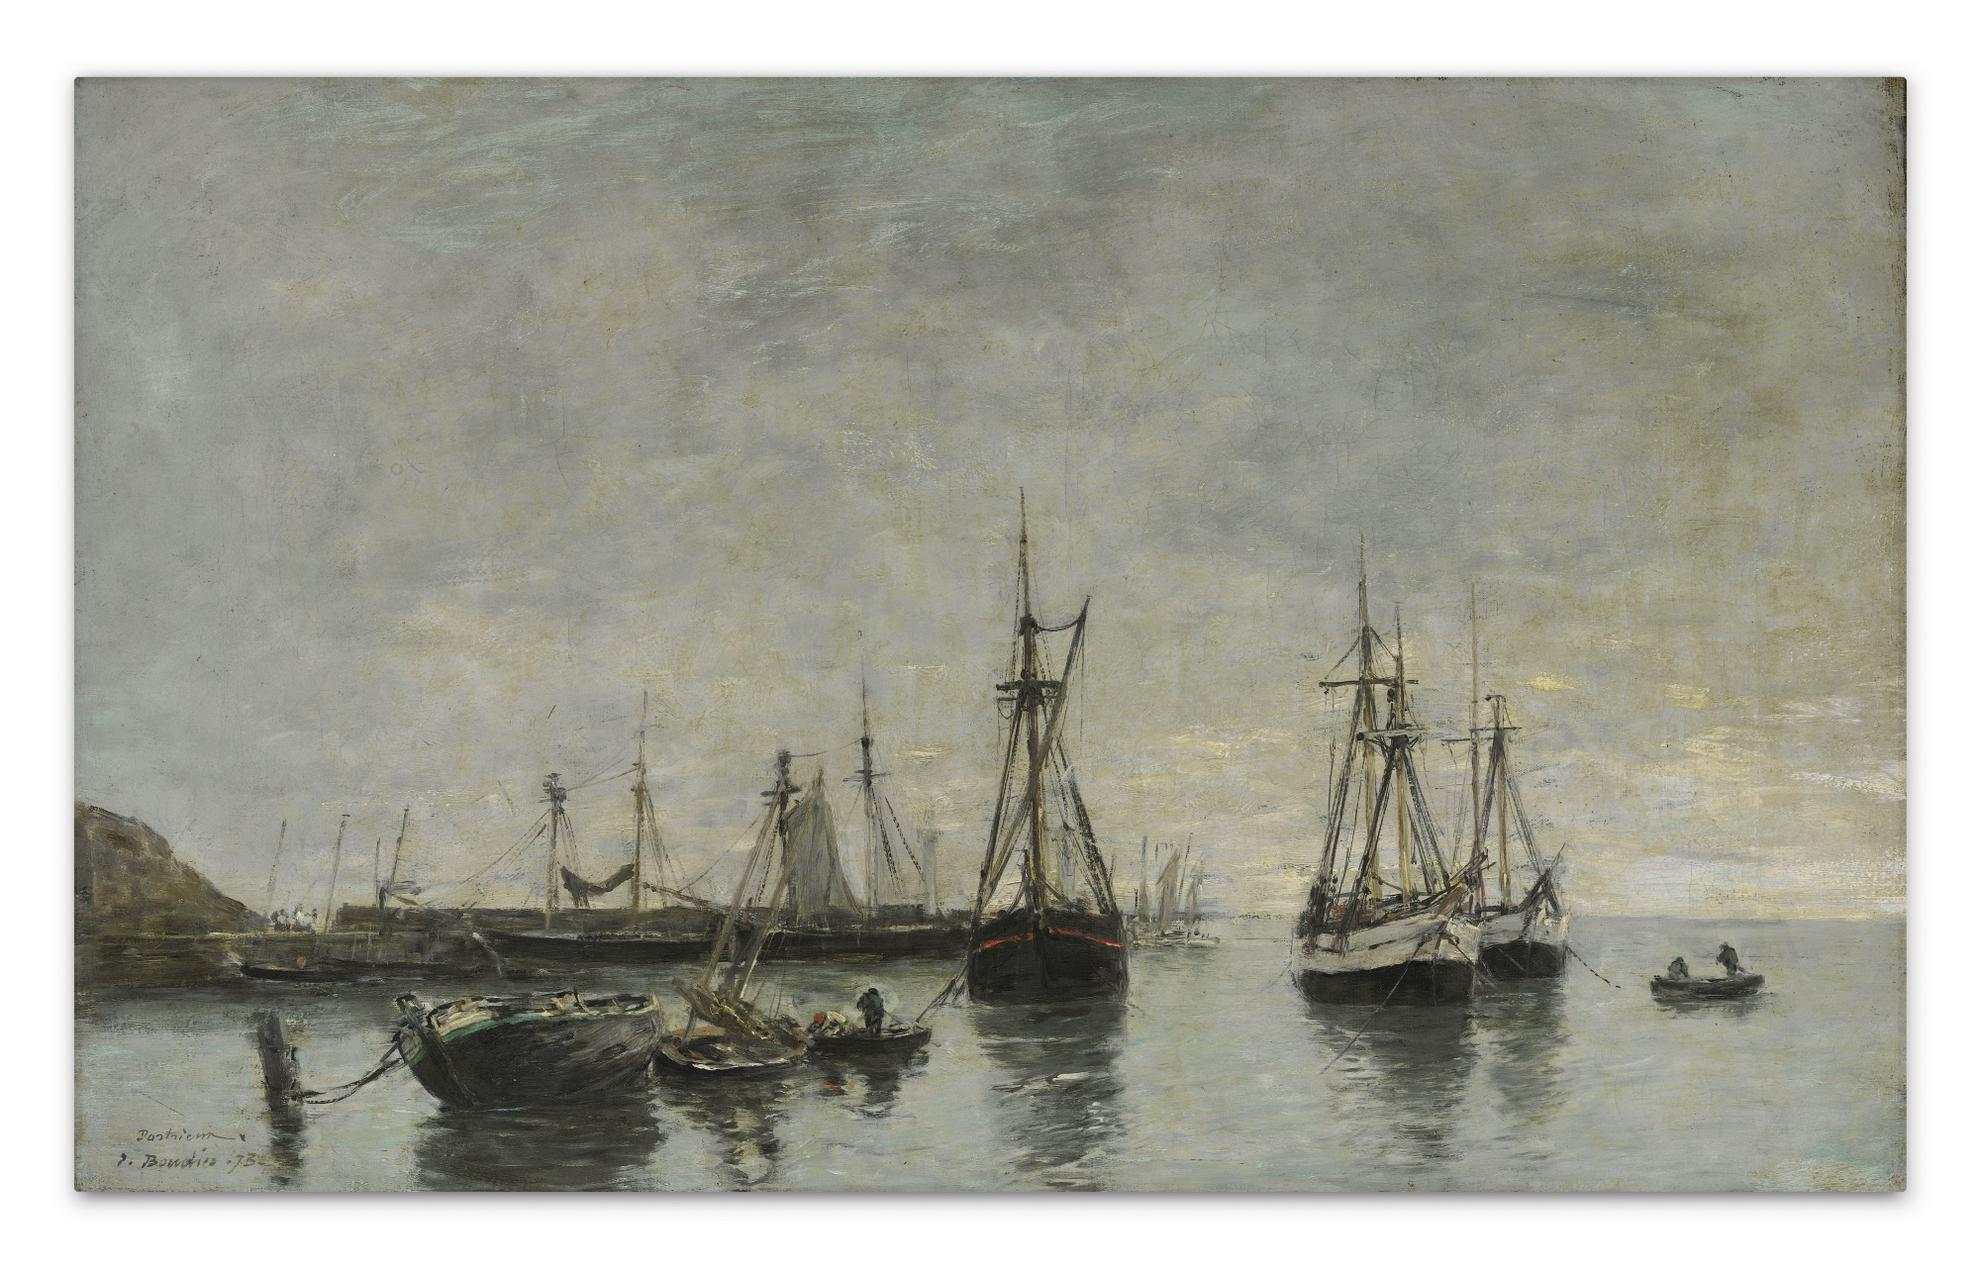 Eugene Louis Boudin-Portrieux, Le Matin, Maree Haute-1873